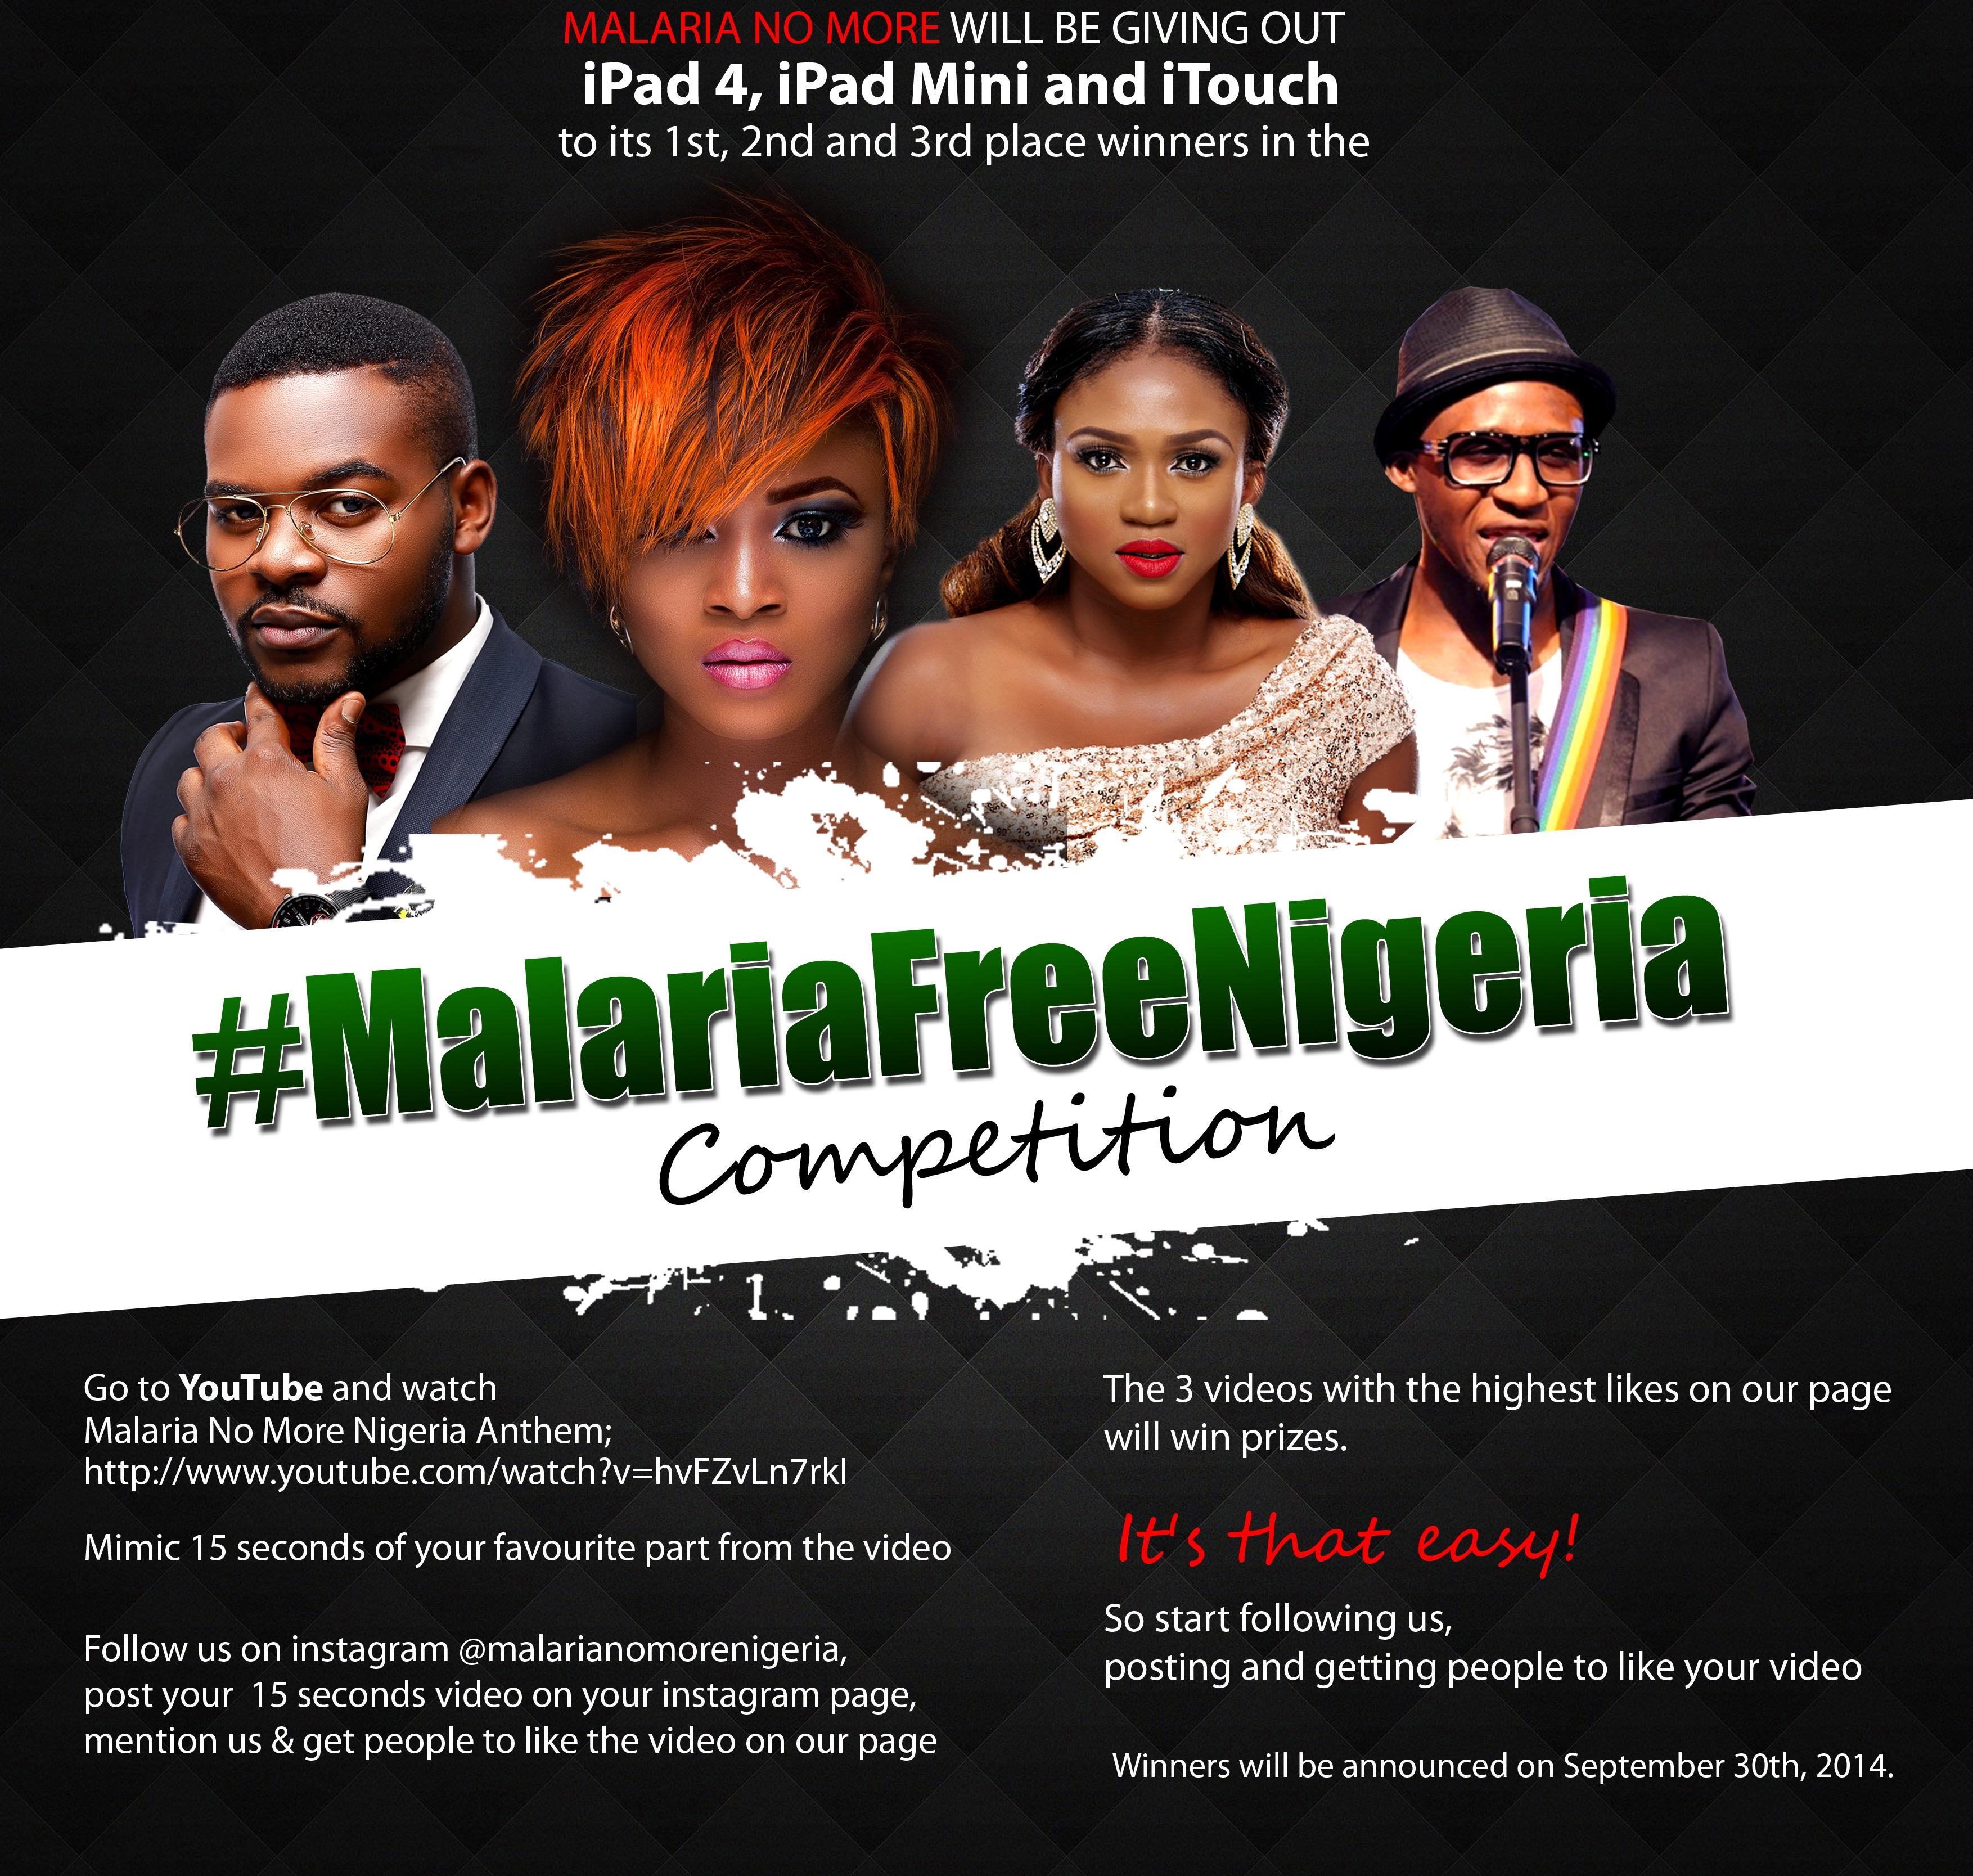 MALARIA FREE NIGERIA Competition